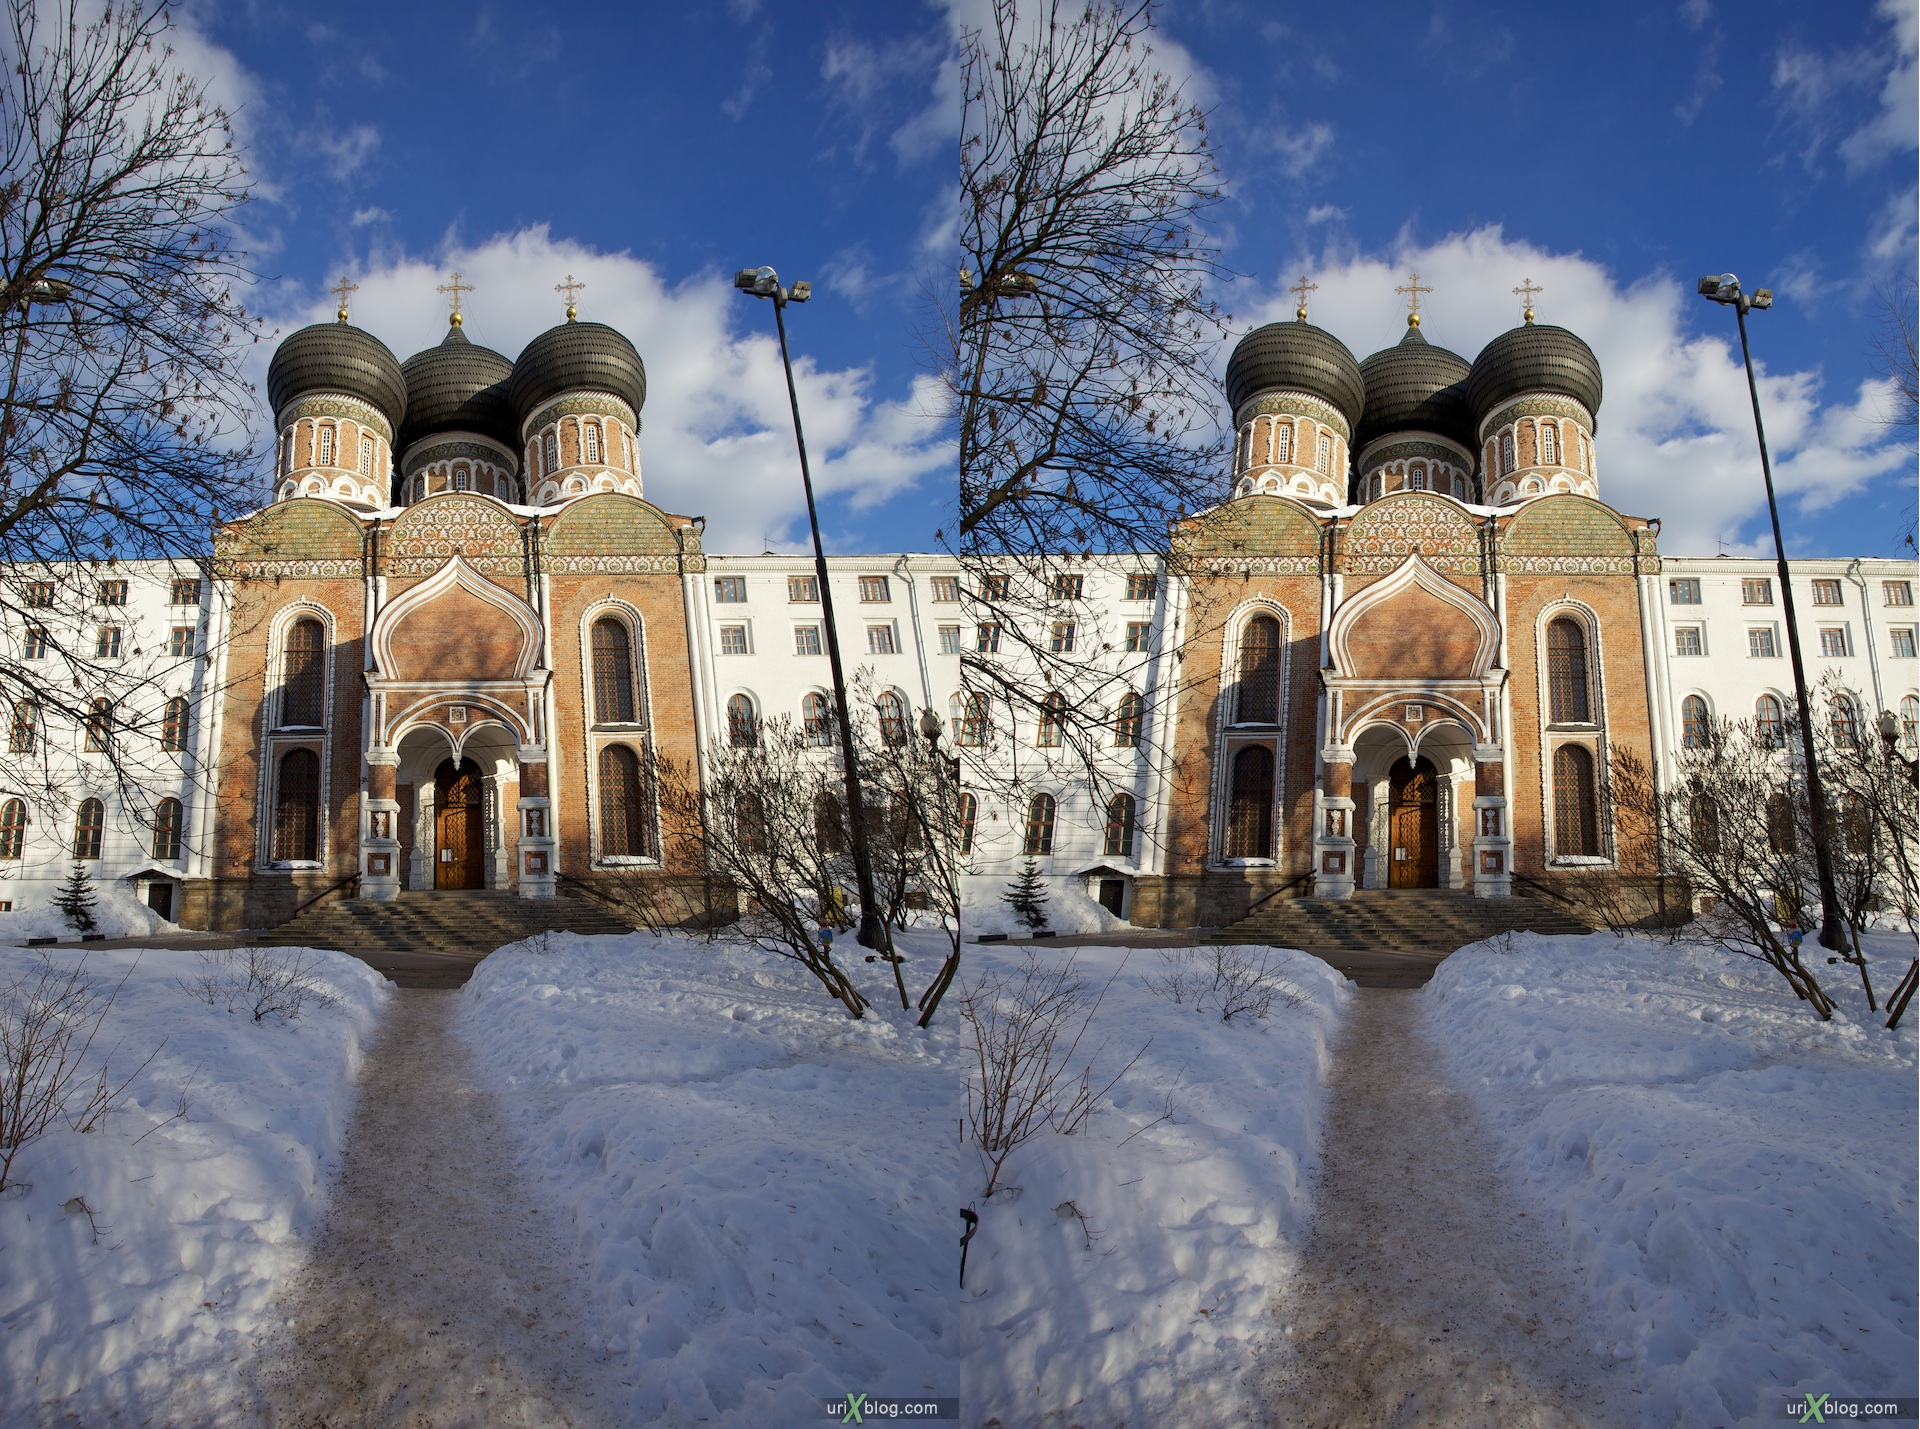 2010 3D, stereo, cross-eyed, стерео, стереопара Москва микрорайон Городок Баумана Серебряно-Виноградный пруд